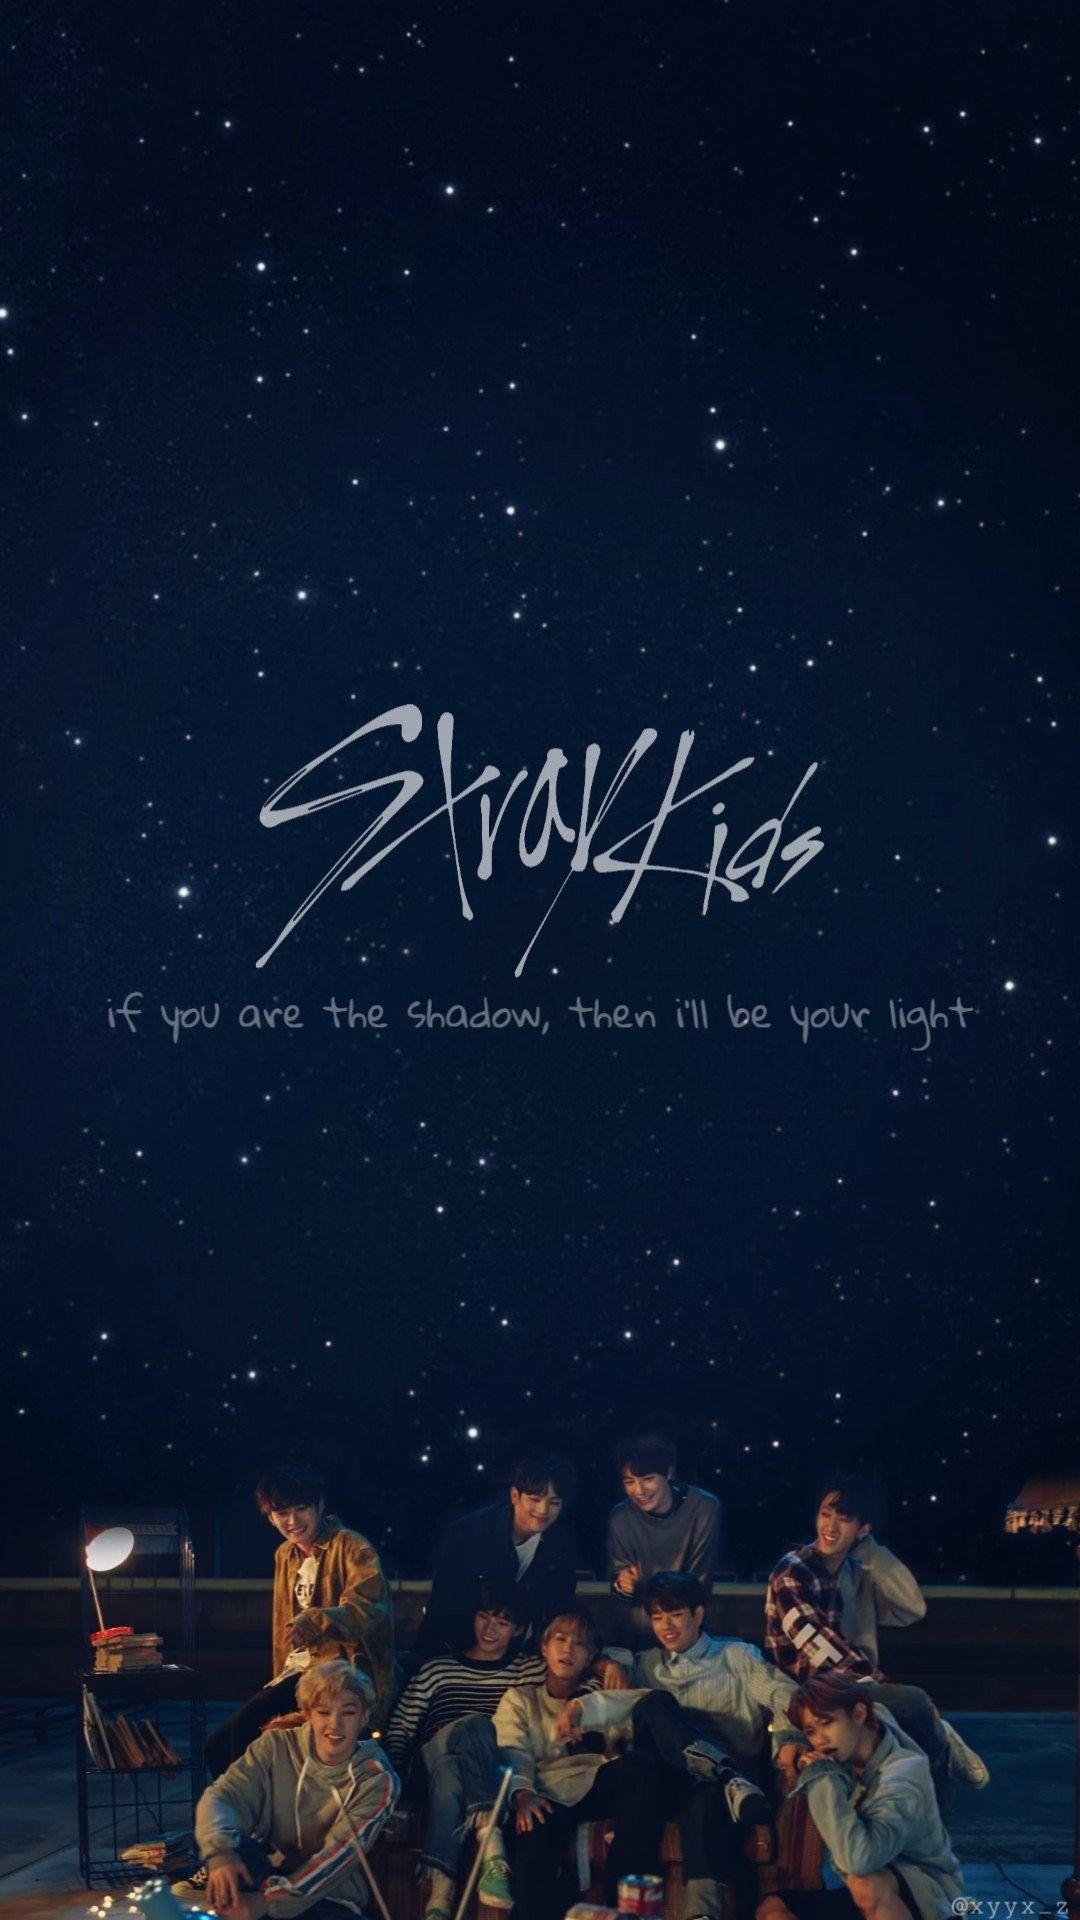 Stray kids lockscreen #스트레이키즈 #straykids | stray kids